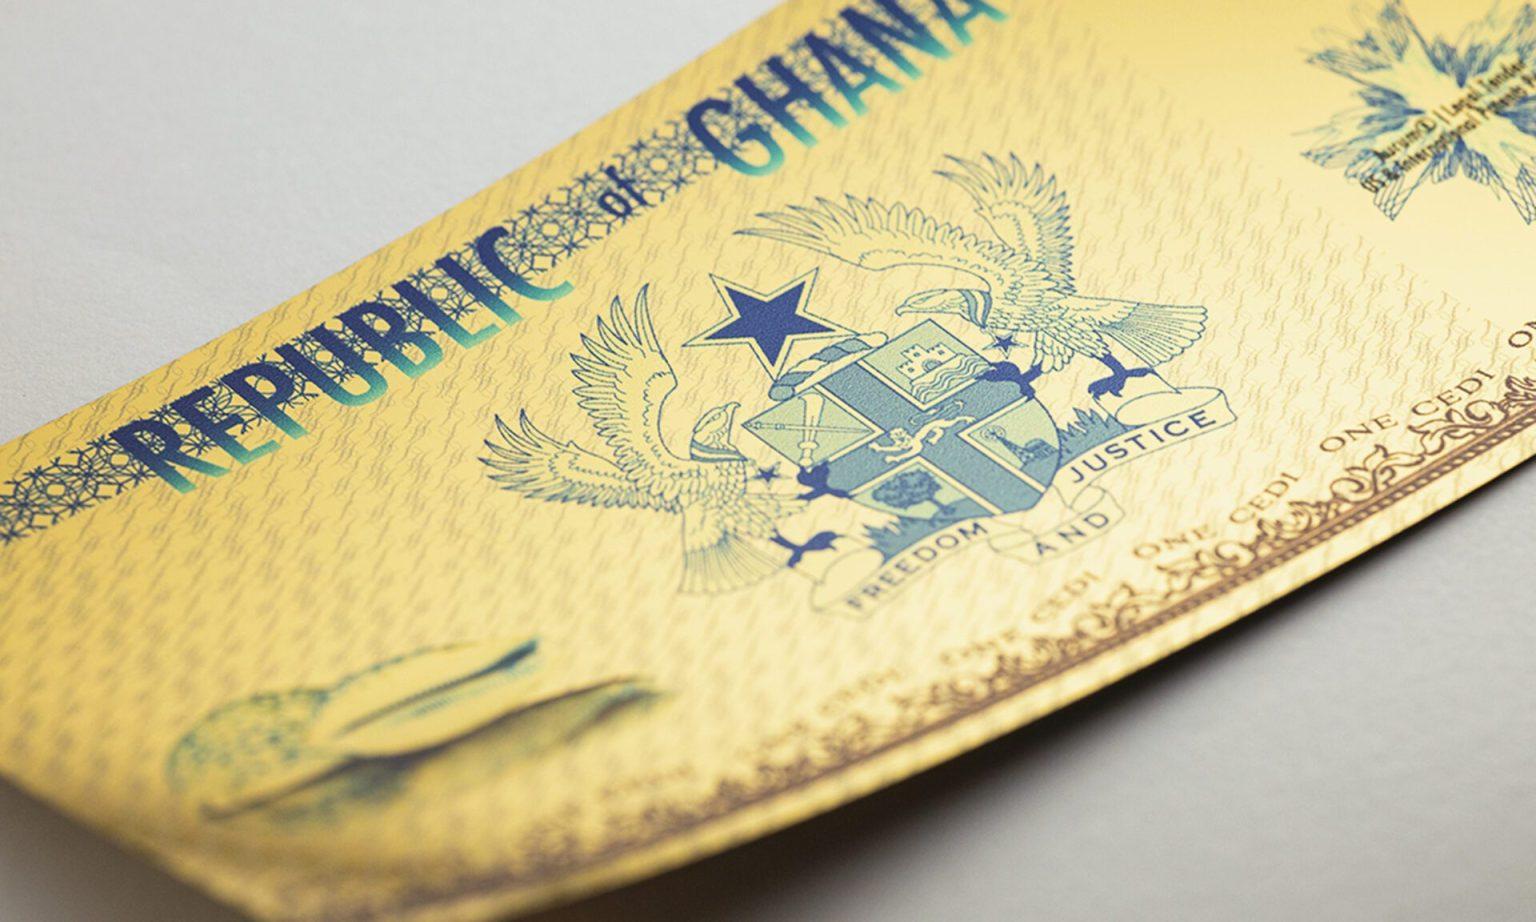 Republic of Ghana - 1 Cedi